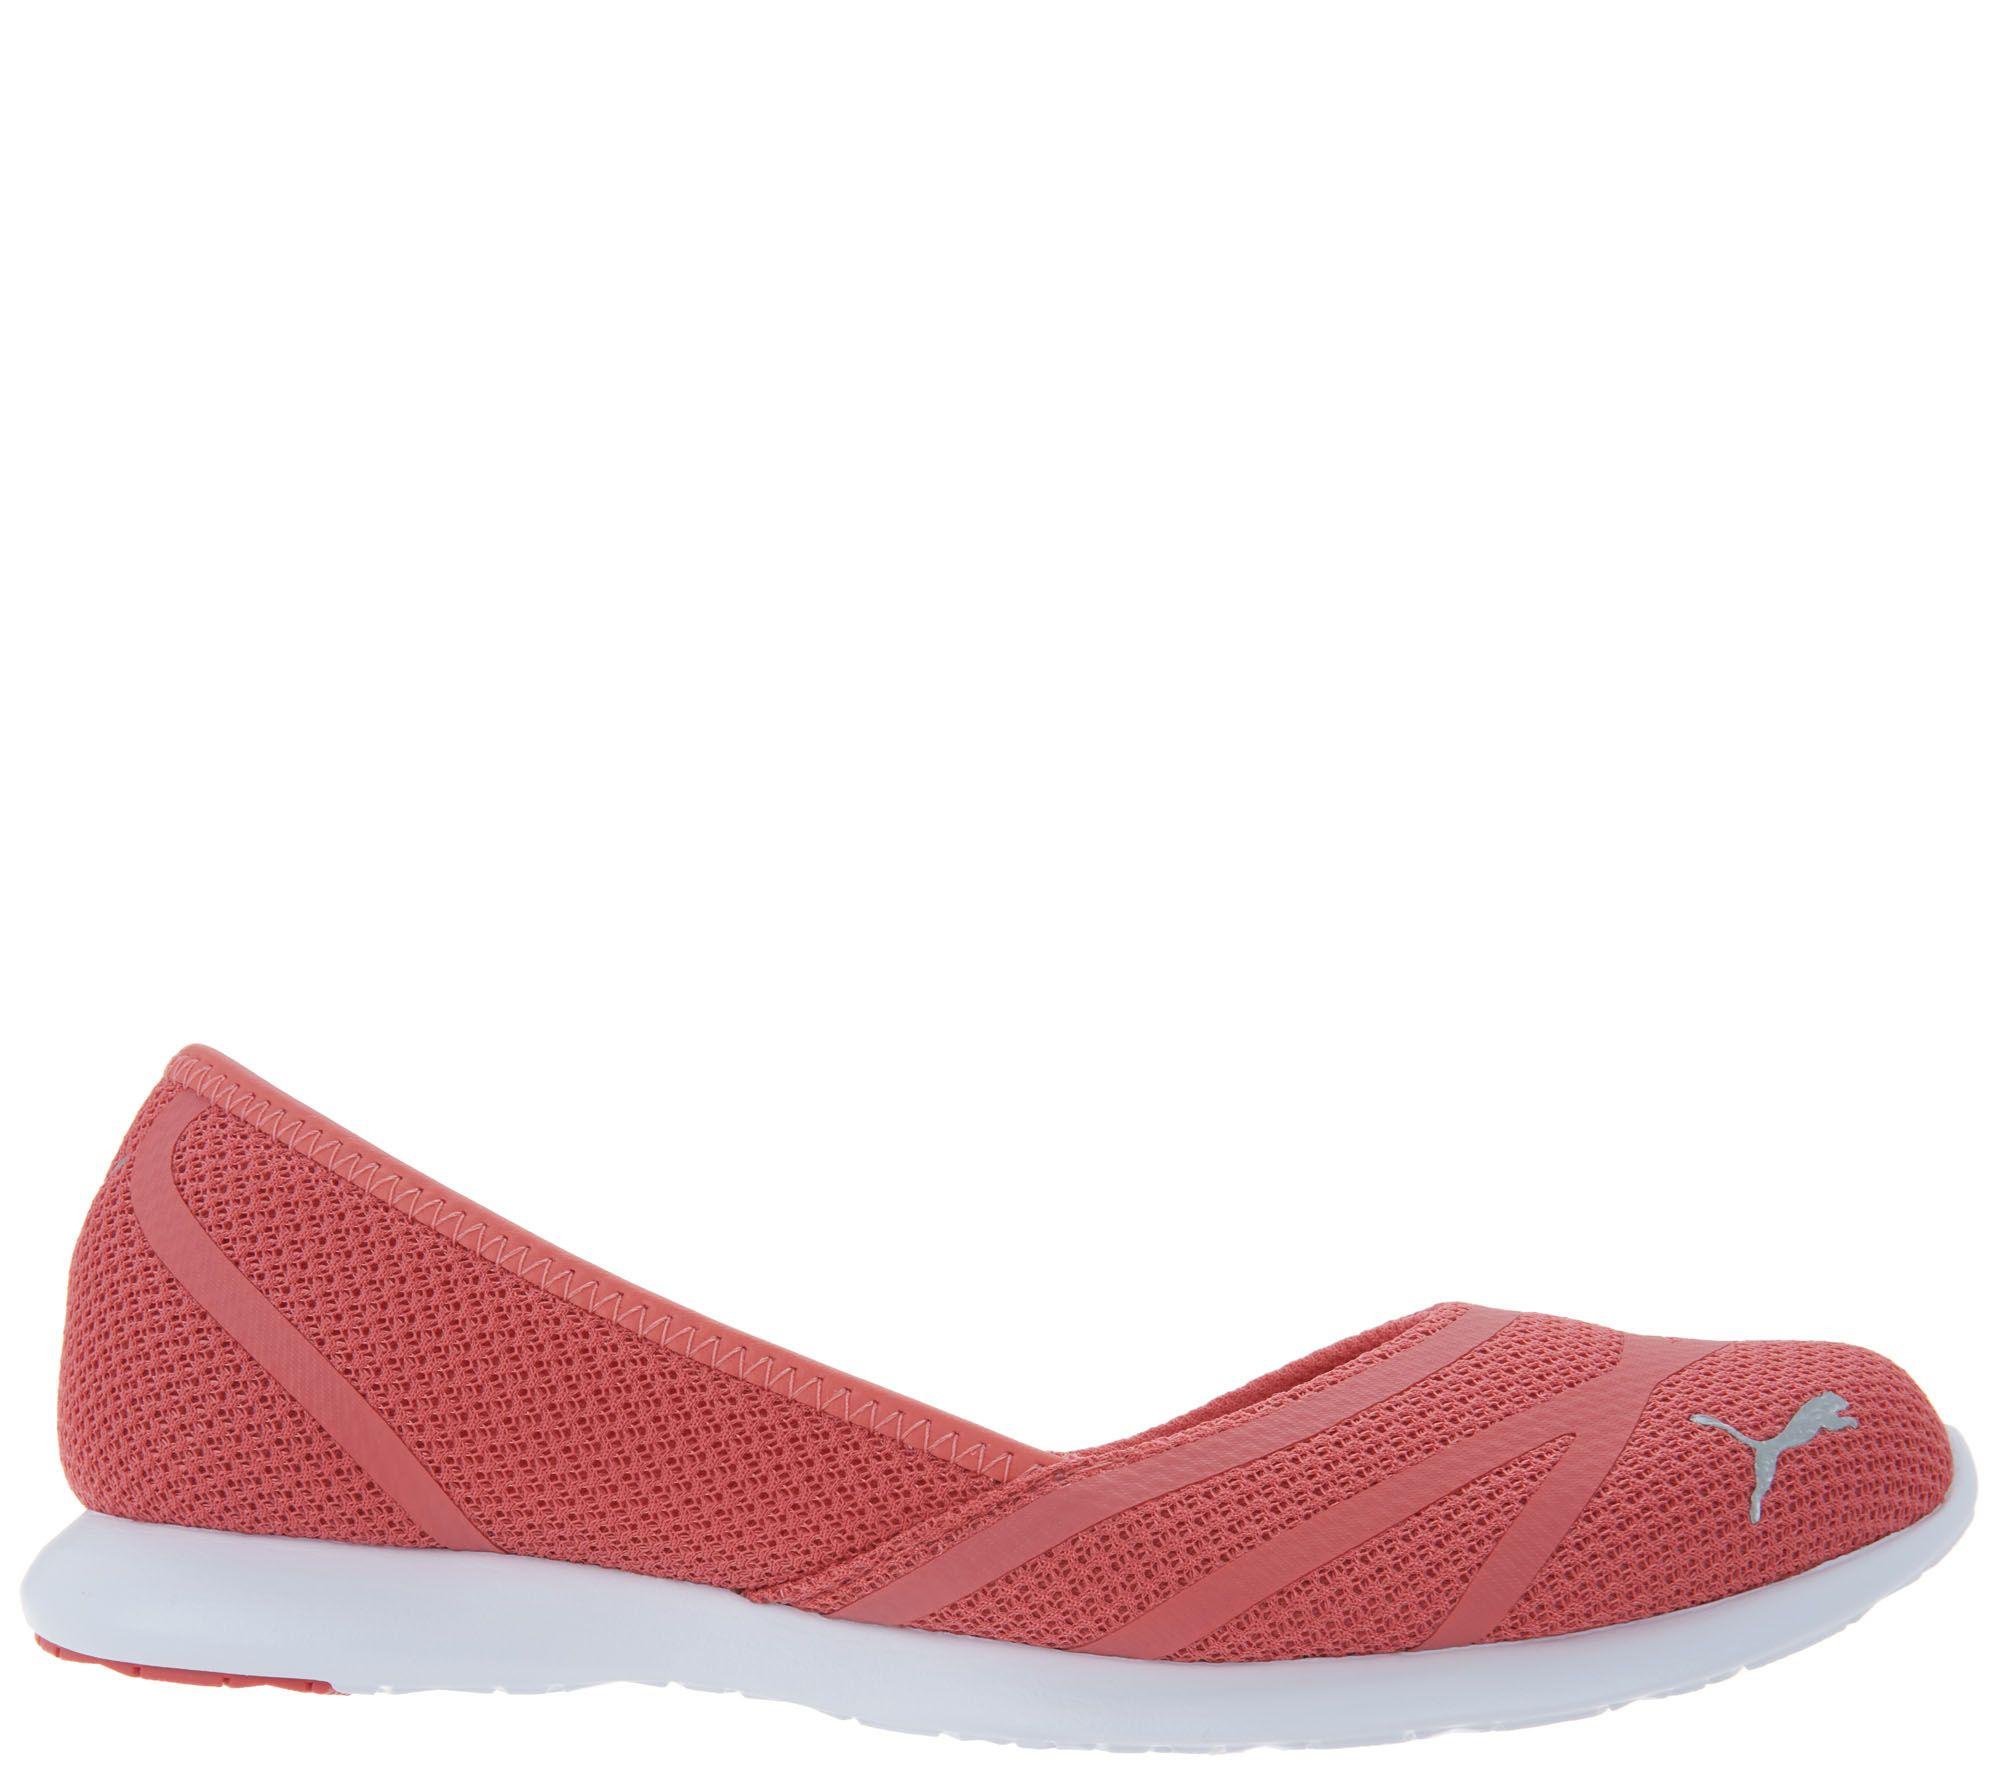 03b5cbf1248e31 PUMA Mesh Slip-On Shoes - Vega Ballet - Page 1 — QVC.com